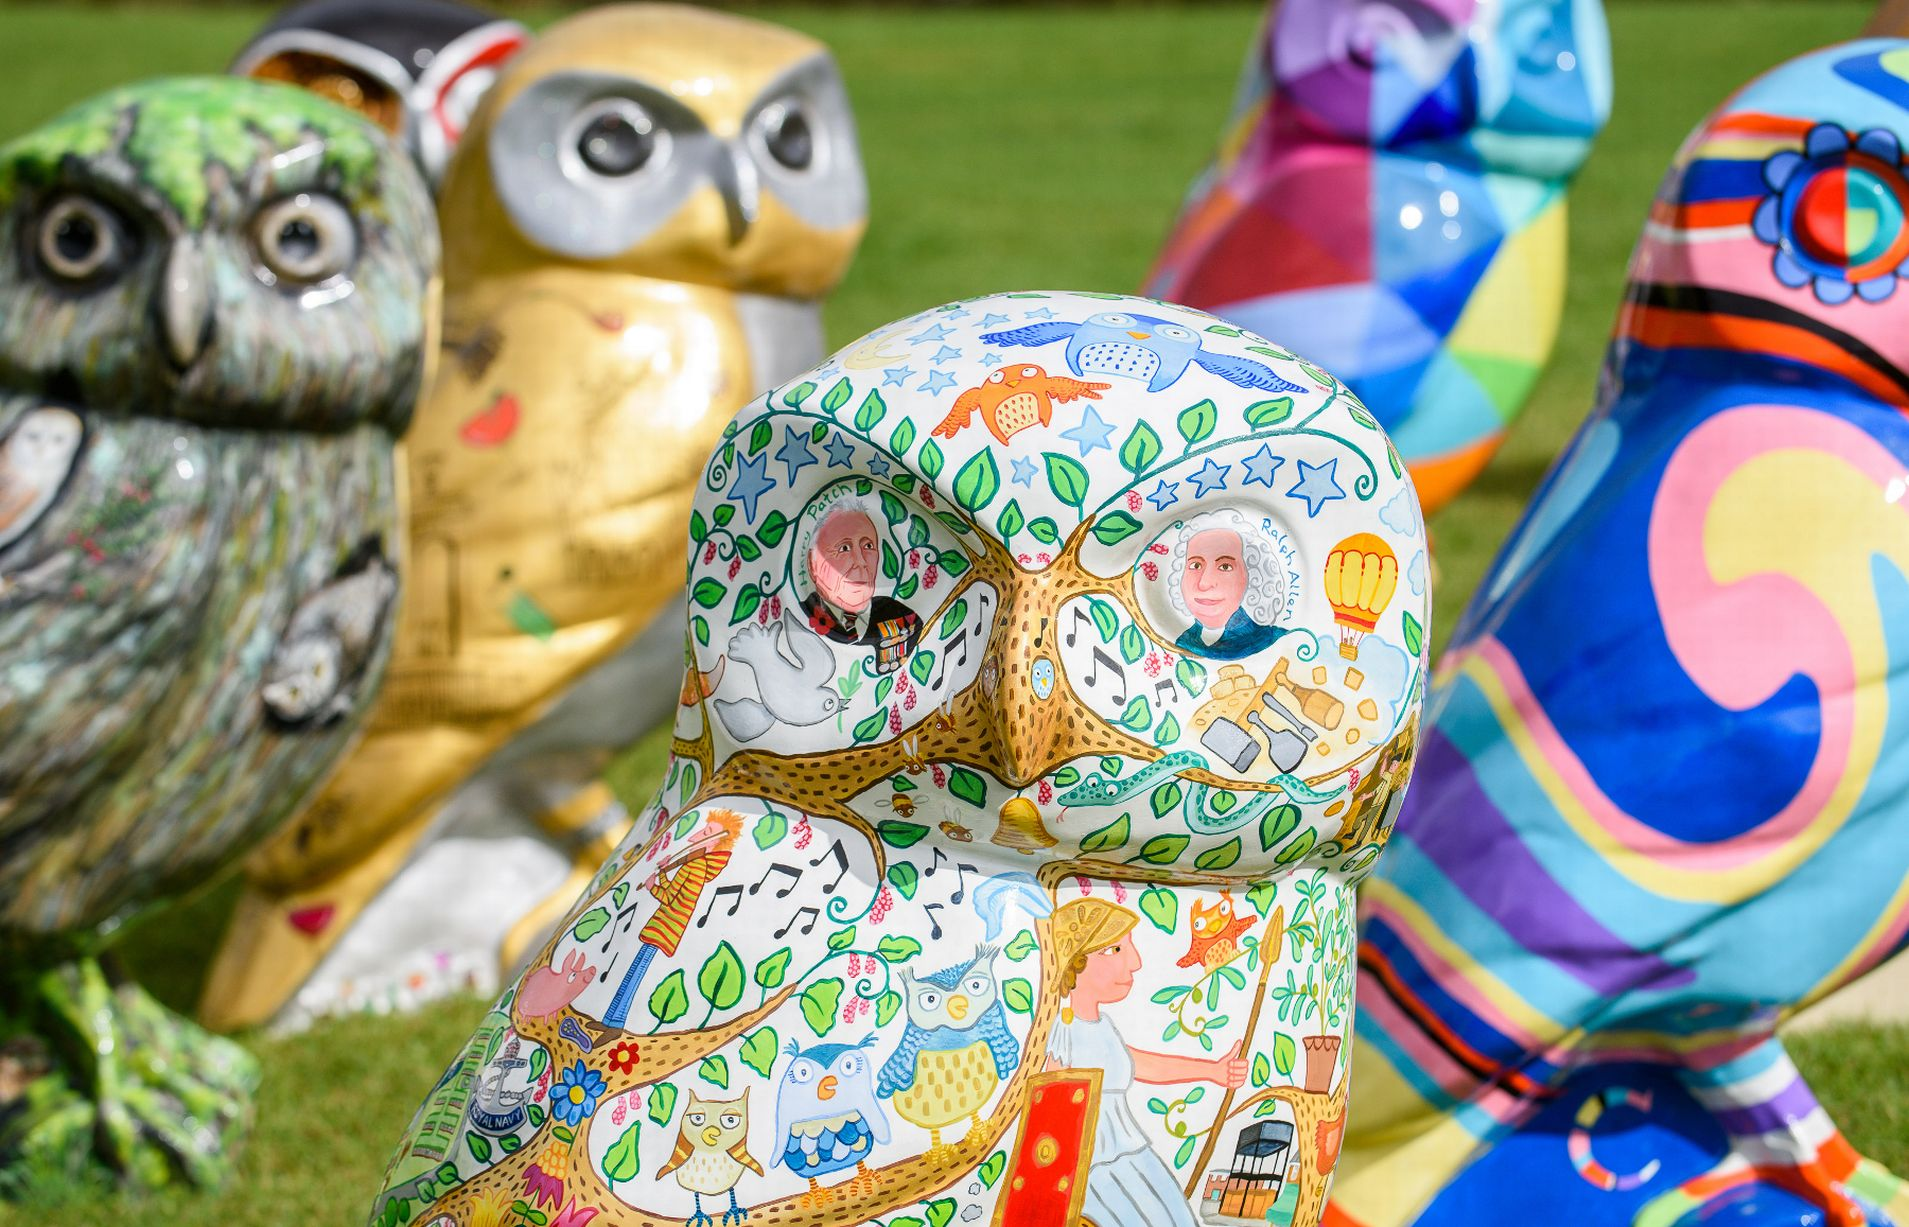 Mowlberry Beak at Minerva's Owls of Bath Launch Credit Paul Gillis